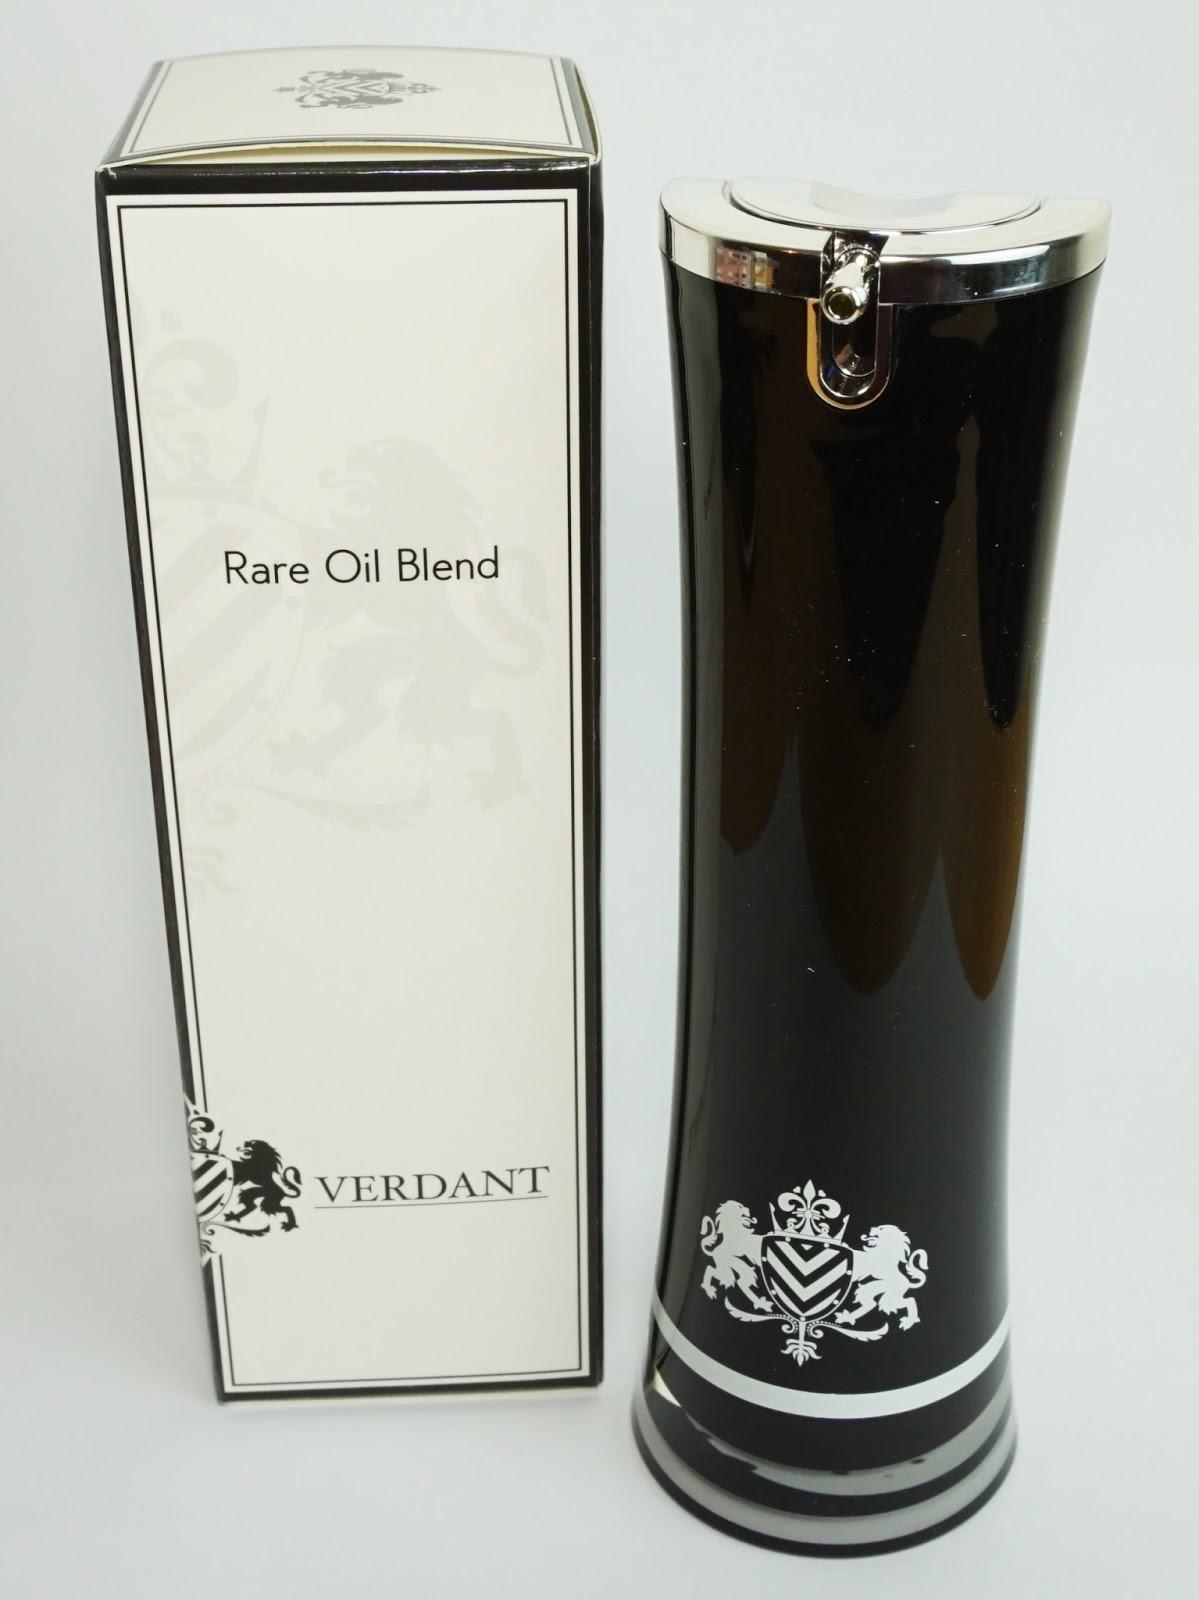 Vestige Verdant - Rare Oil Blend Gesichtsöl Pretty Clover Beauty Blog